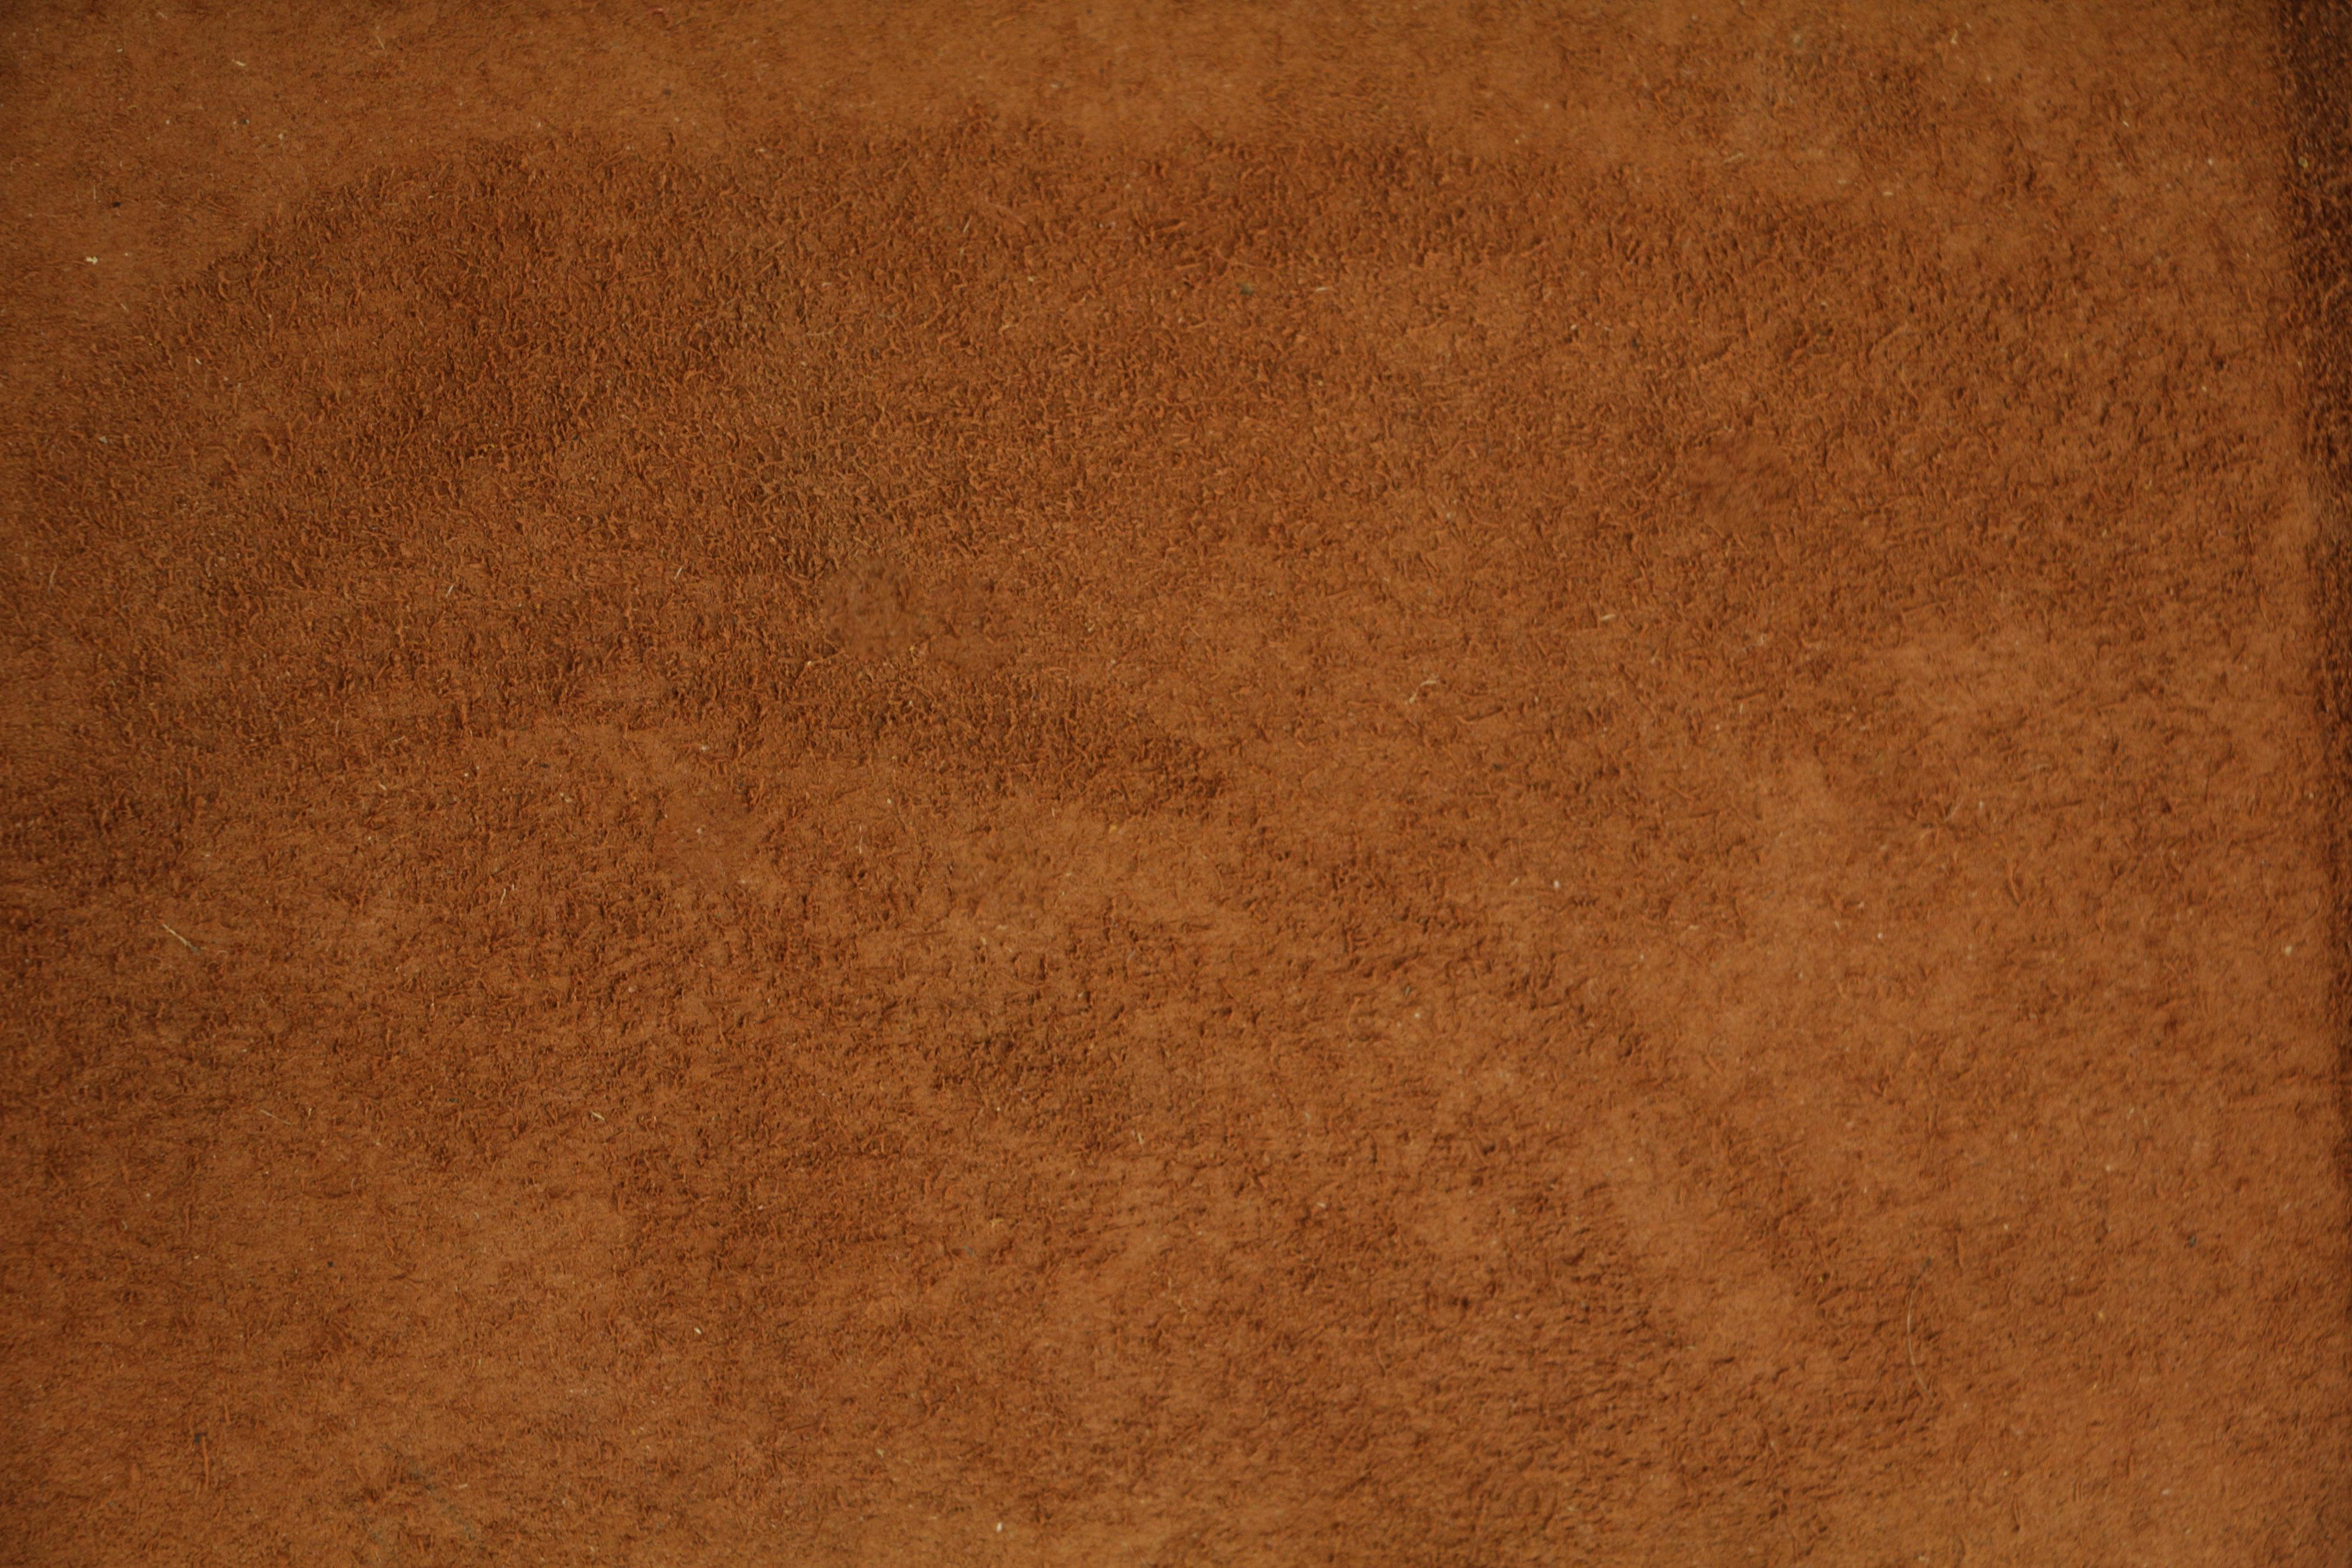 orange leather texture inside grain material wallpaper - TextureX ...